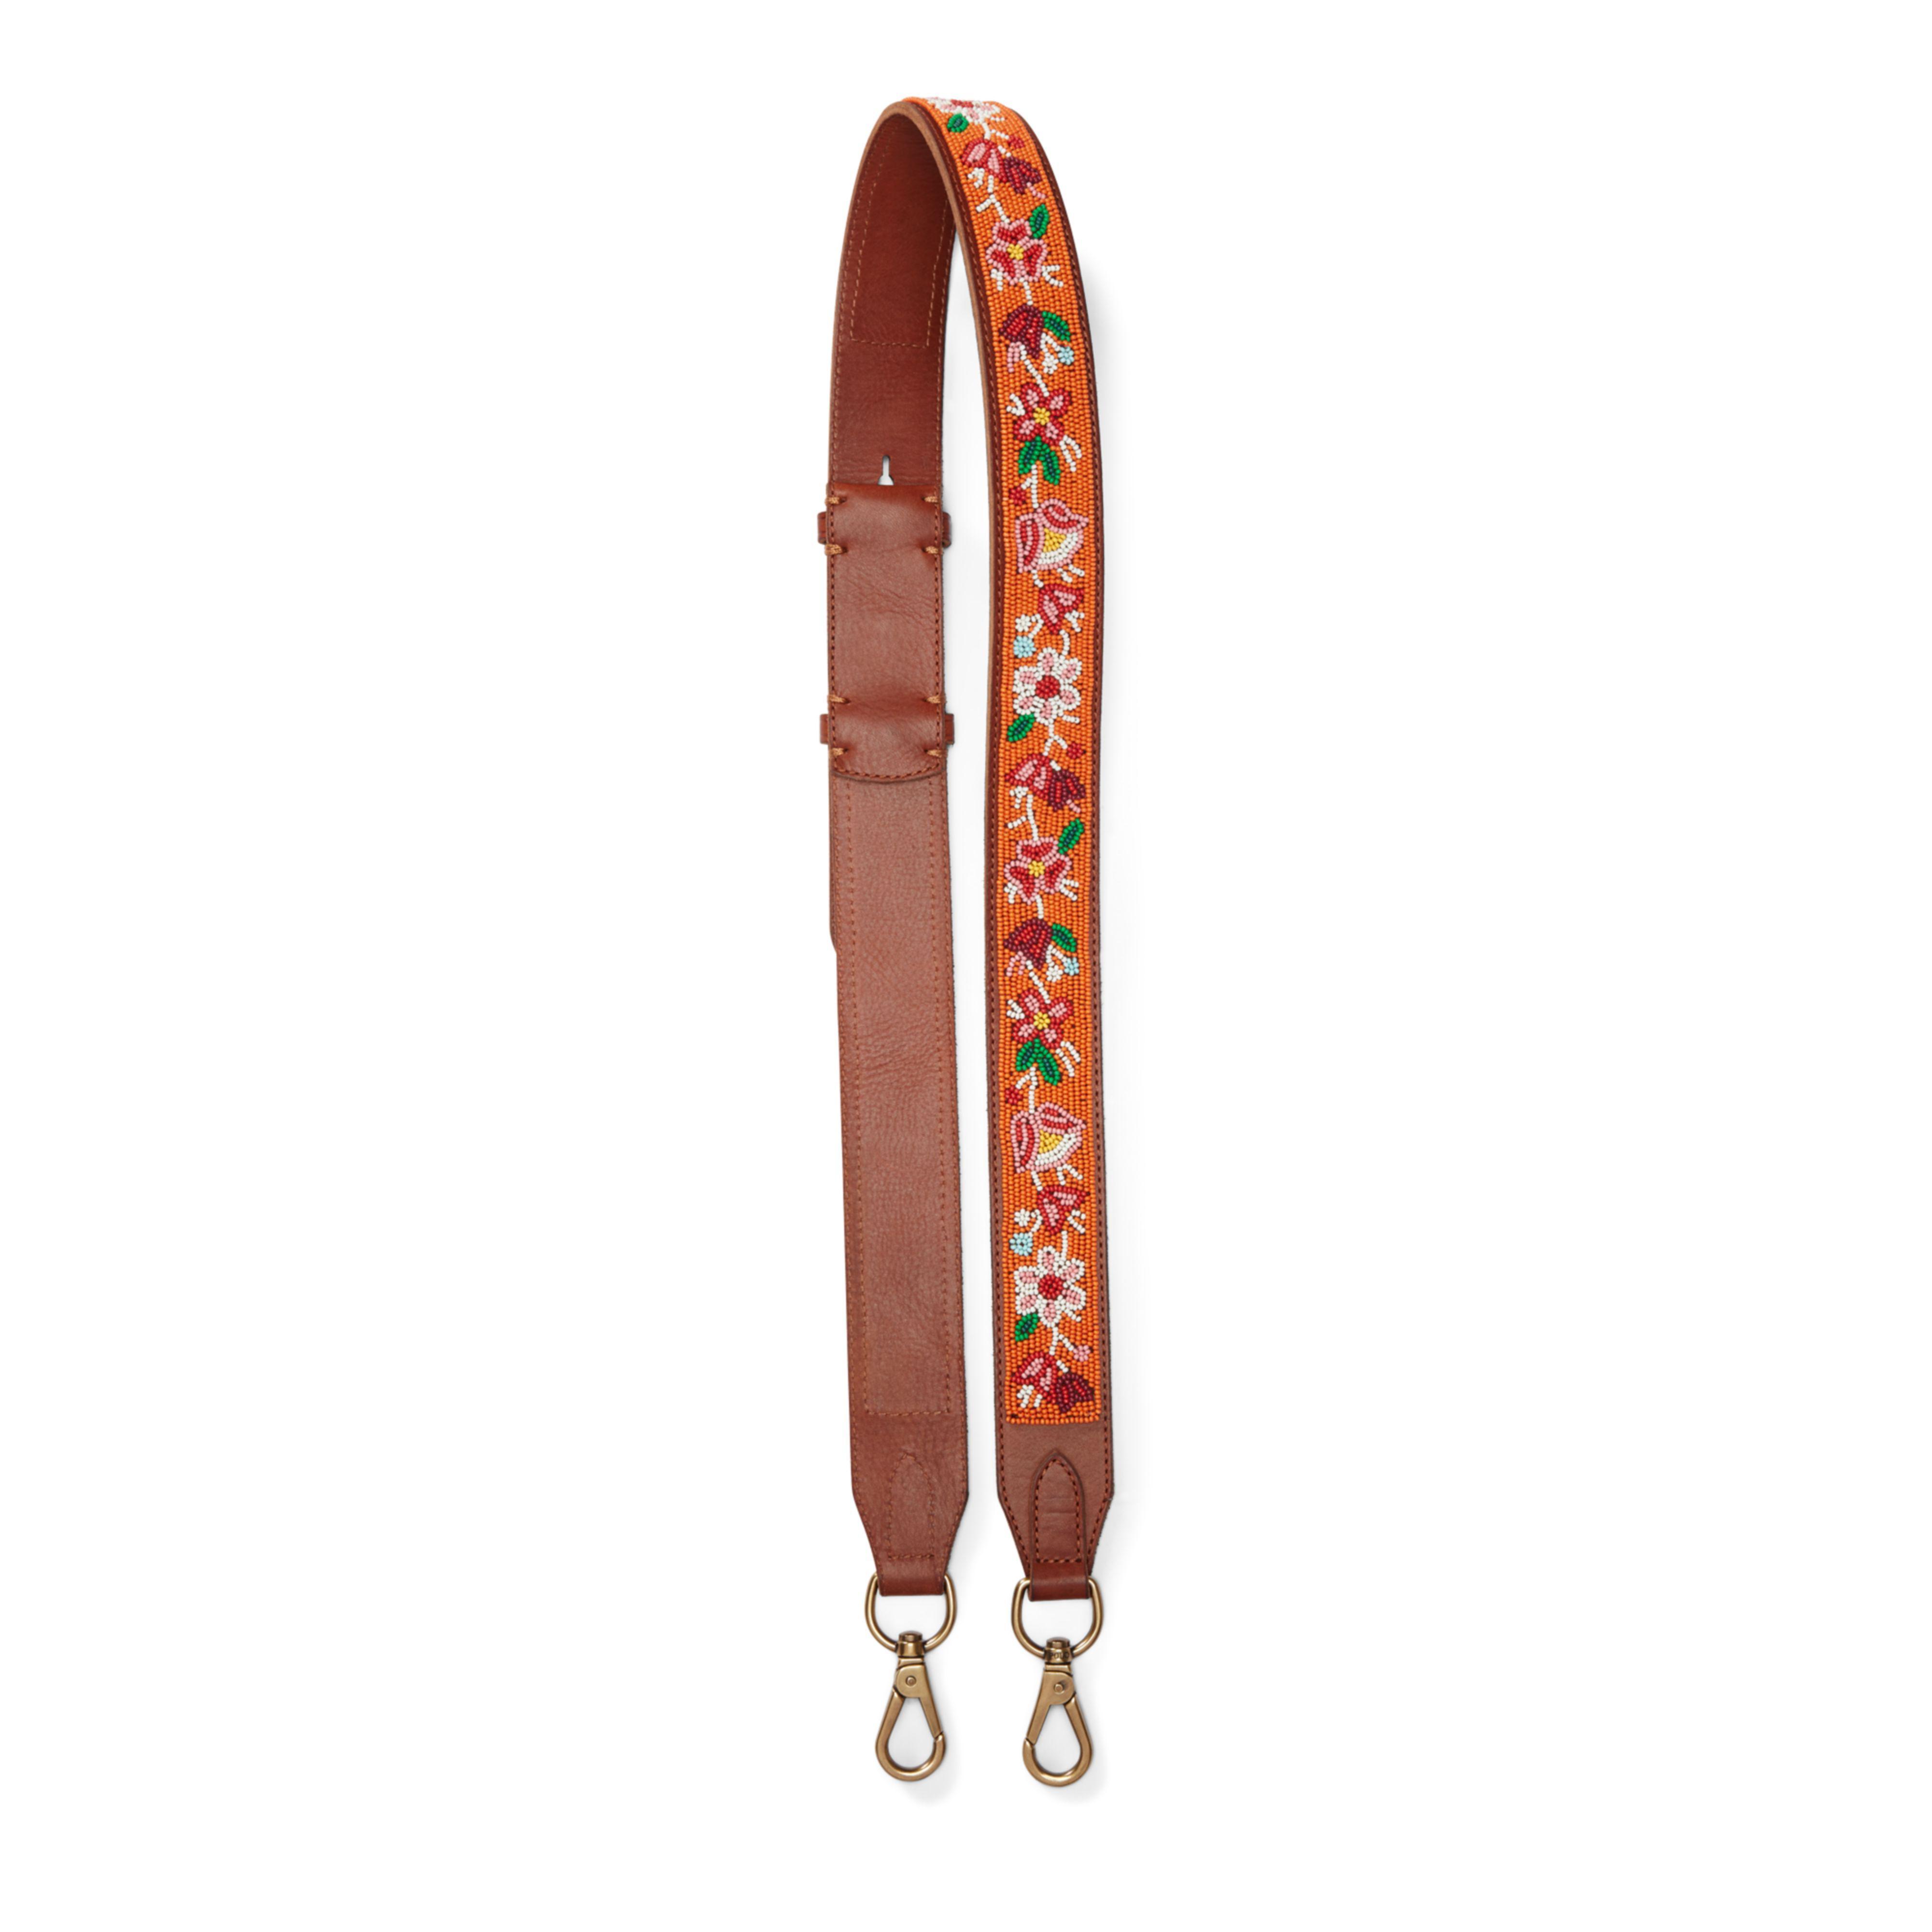 Lyst - Polo Ralph Lauren Floral Leather Strap in Orange d8385b3e8d